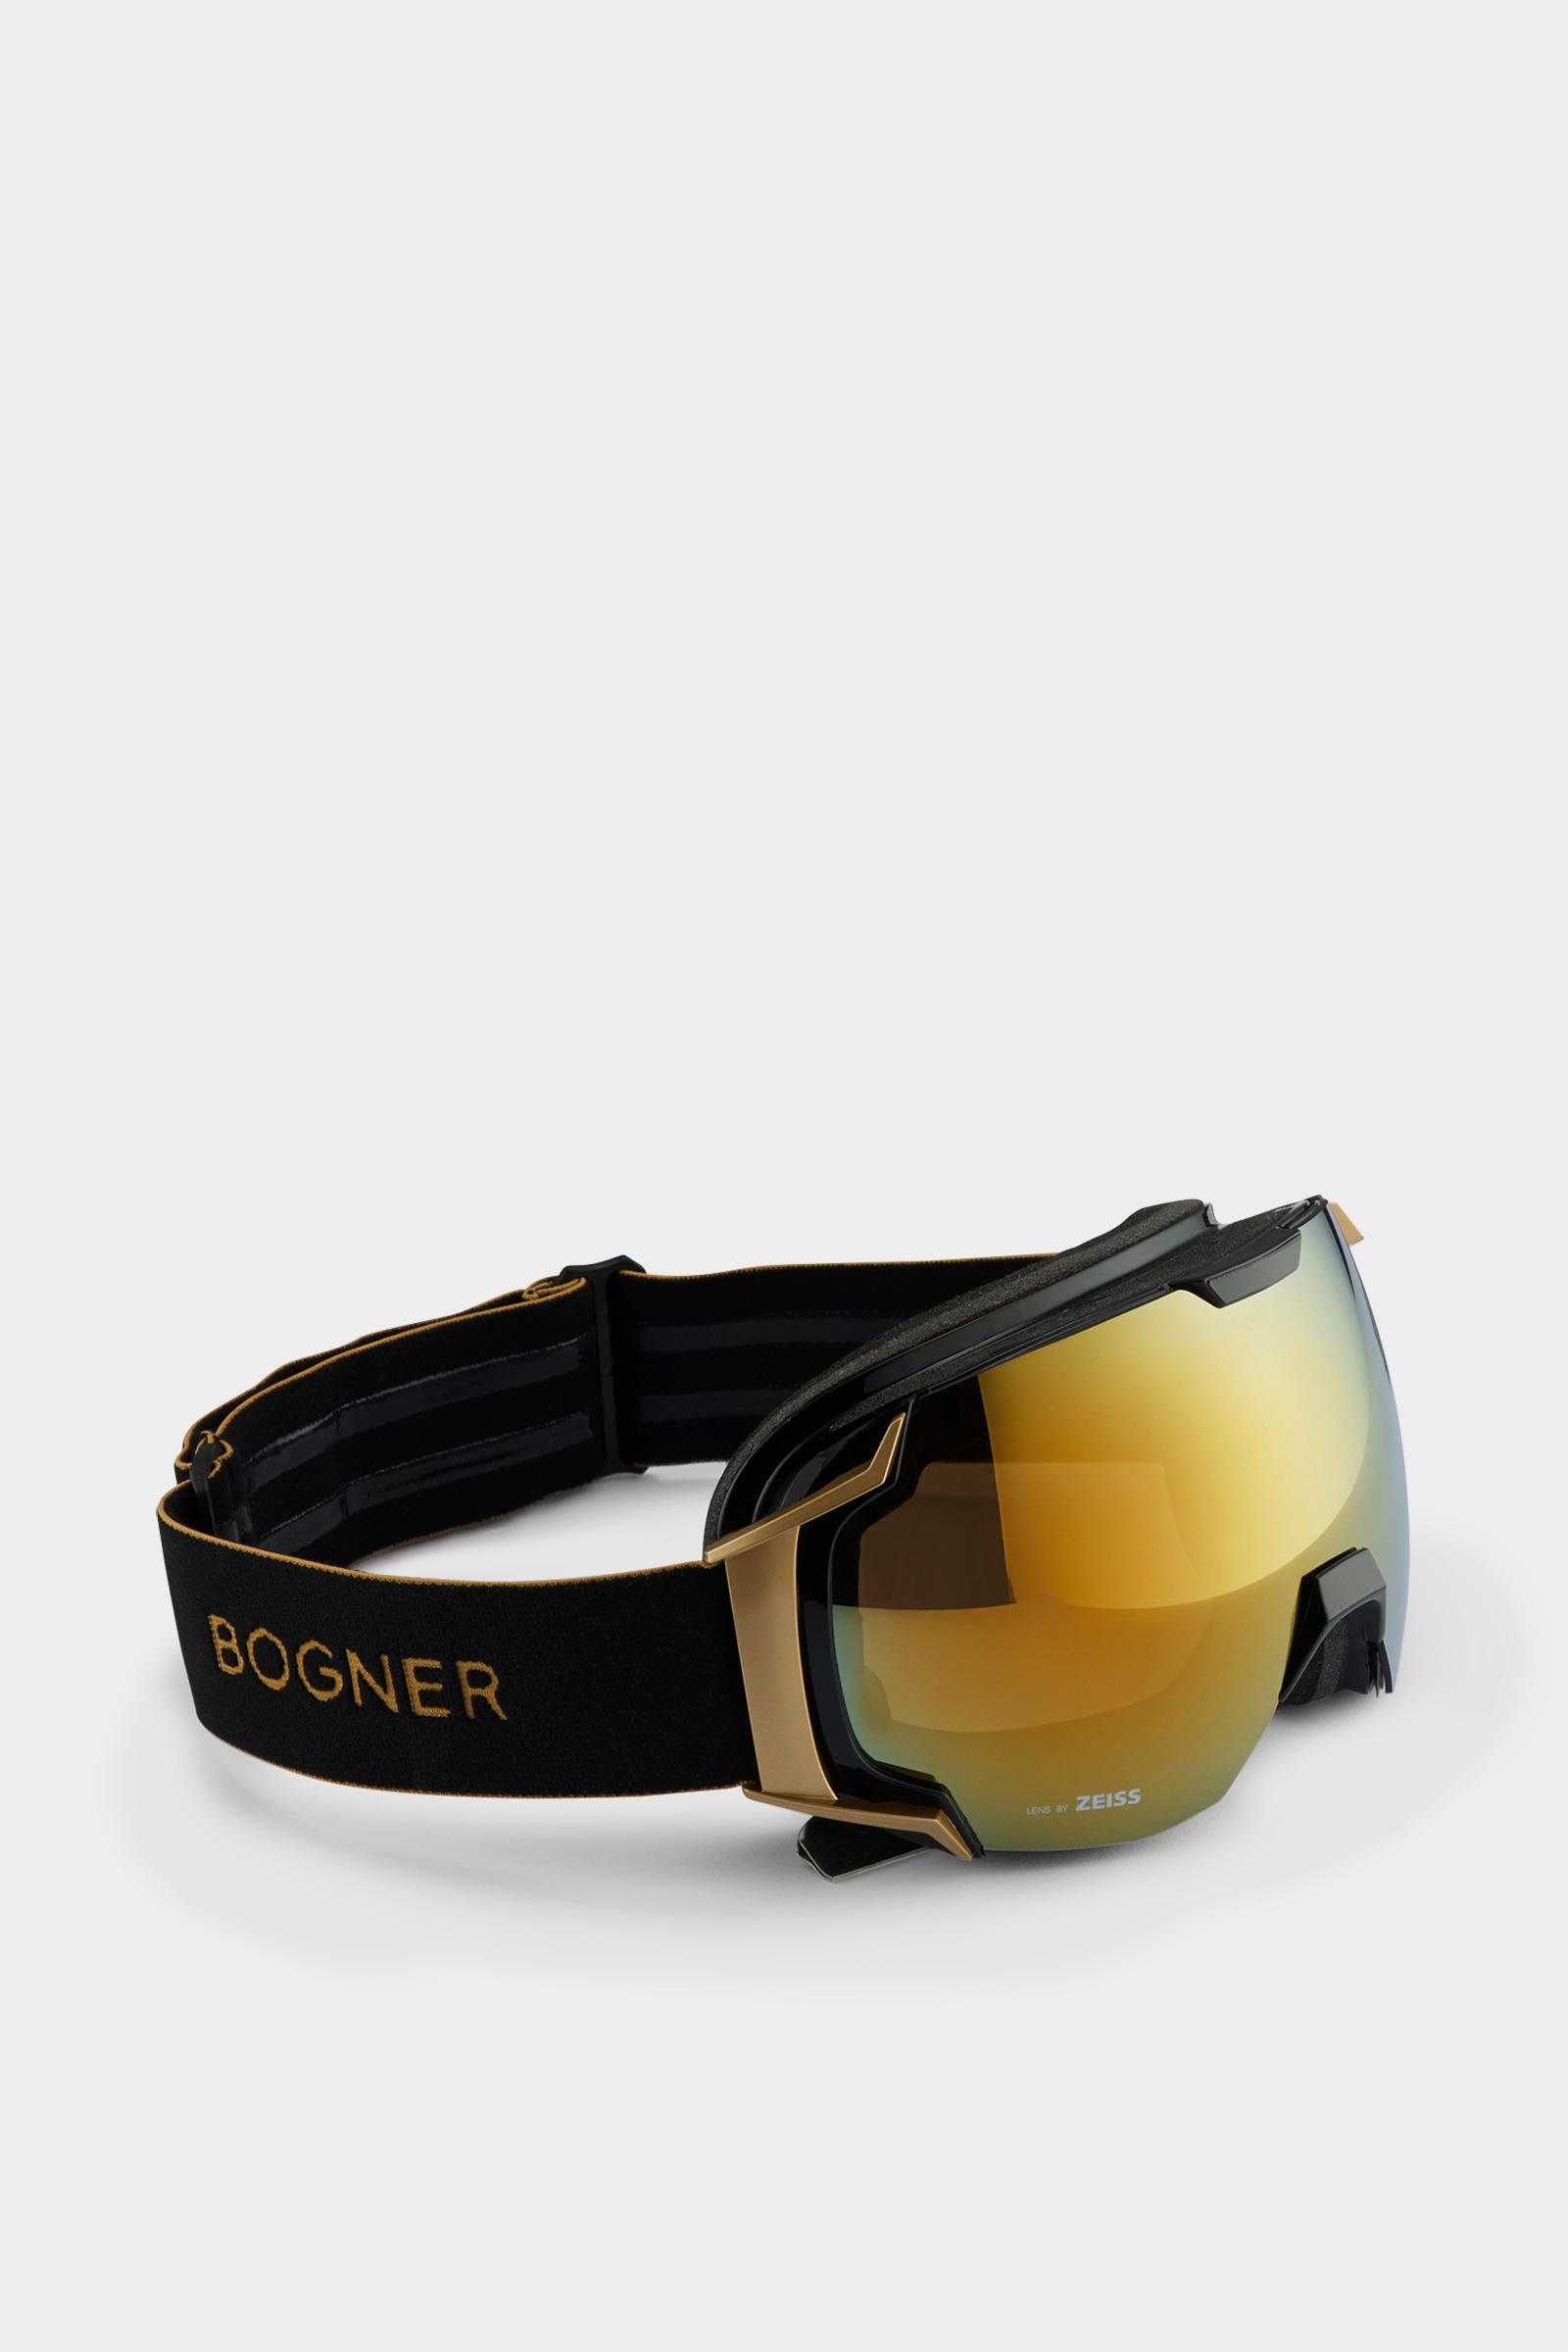 e39ea4d5540 Bogner - Metallic Just-b Gold Ski goggles In Black for Men - Lyst. View  fullscreen